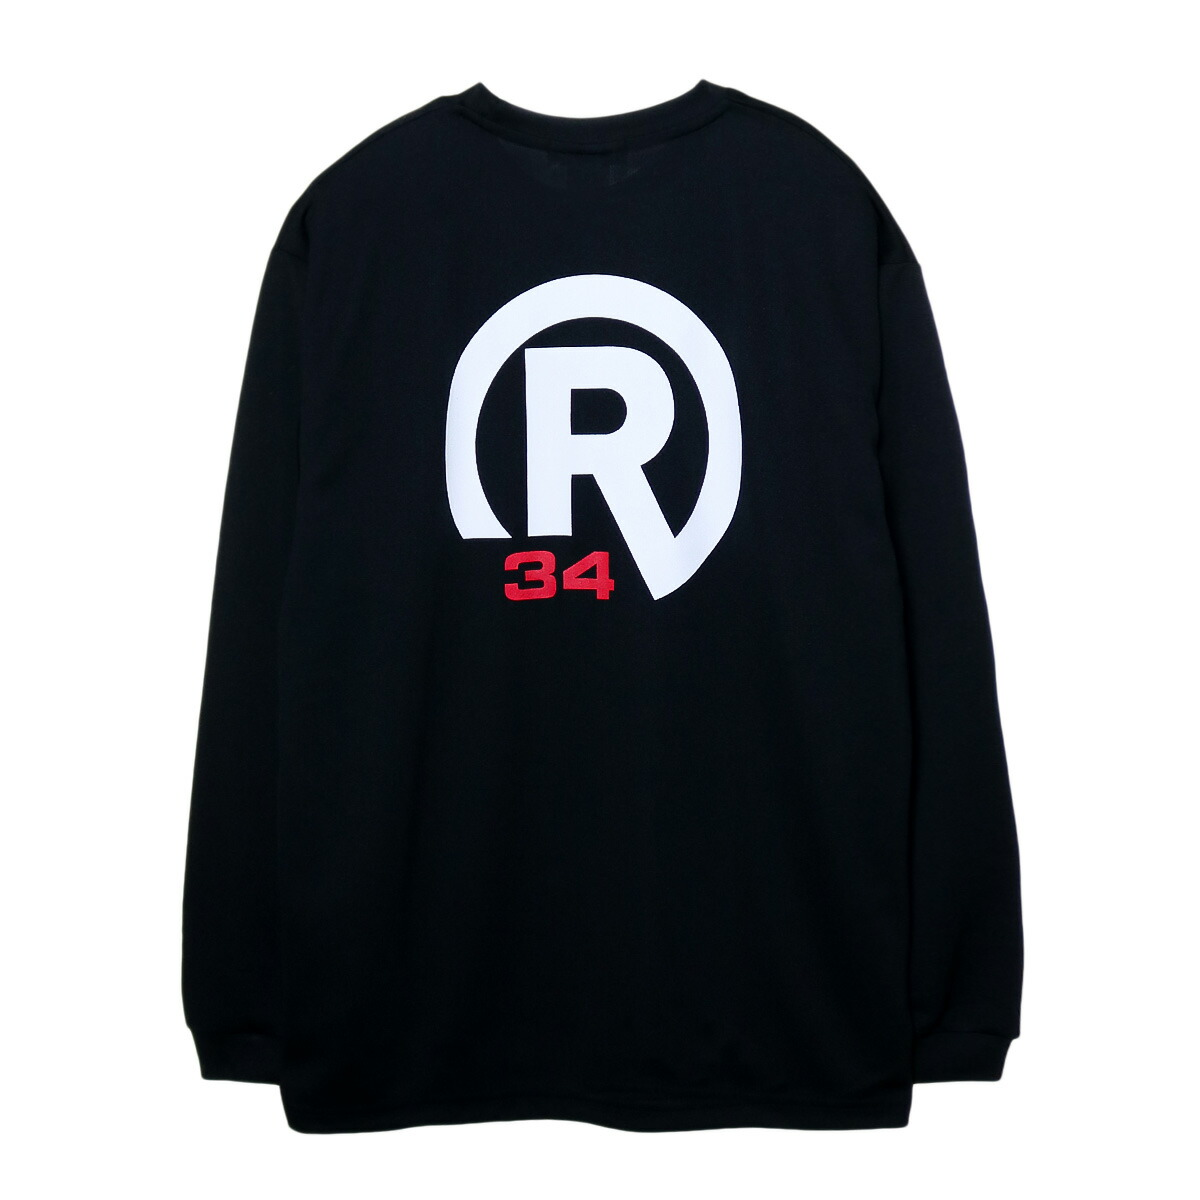 BASIC R34 LOGO DRY LONG T-SHIRT BIG SIZE